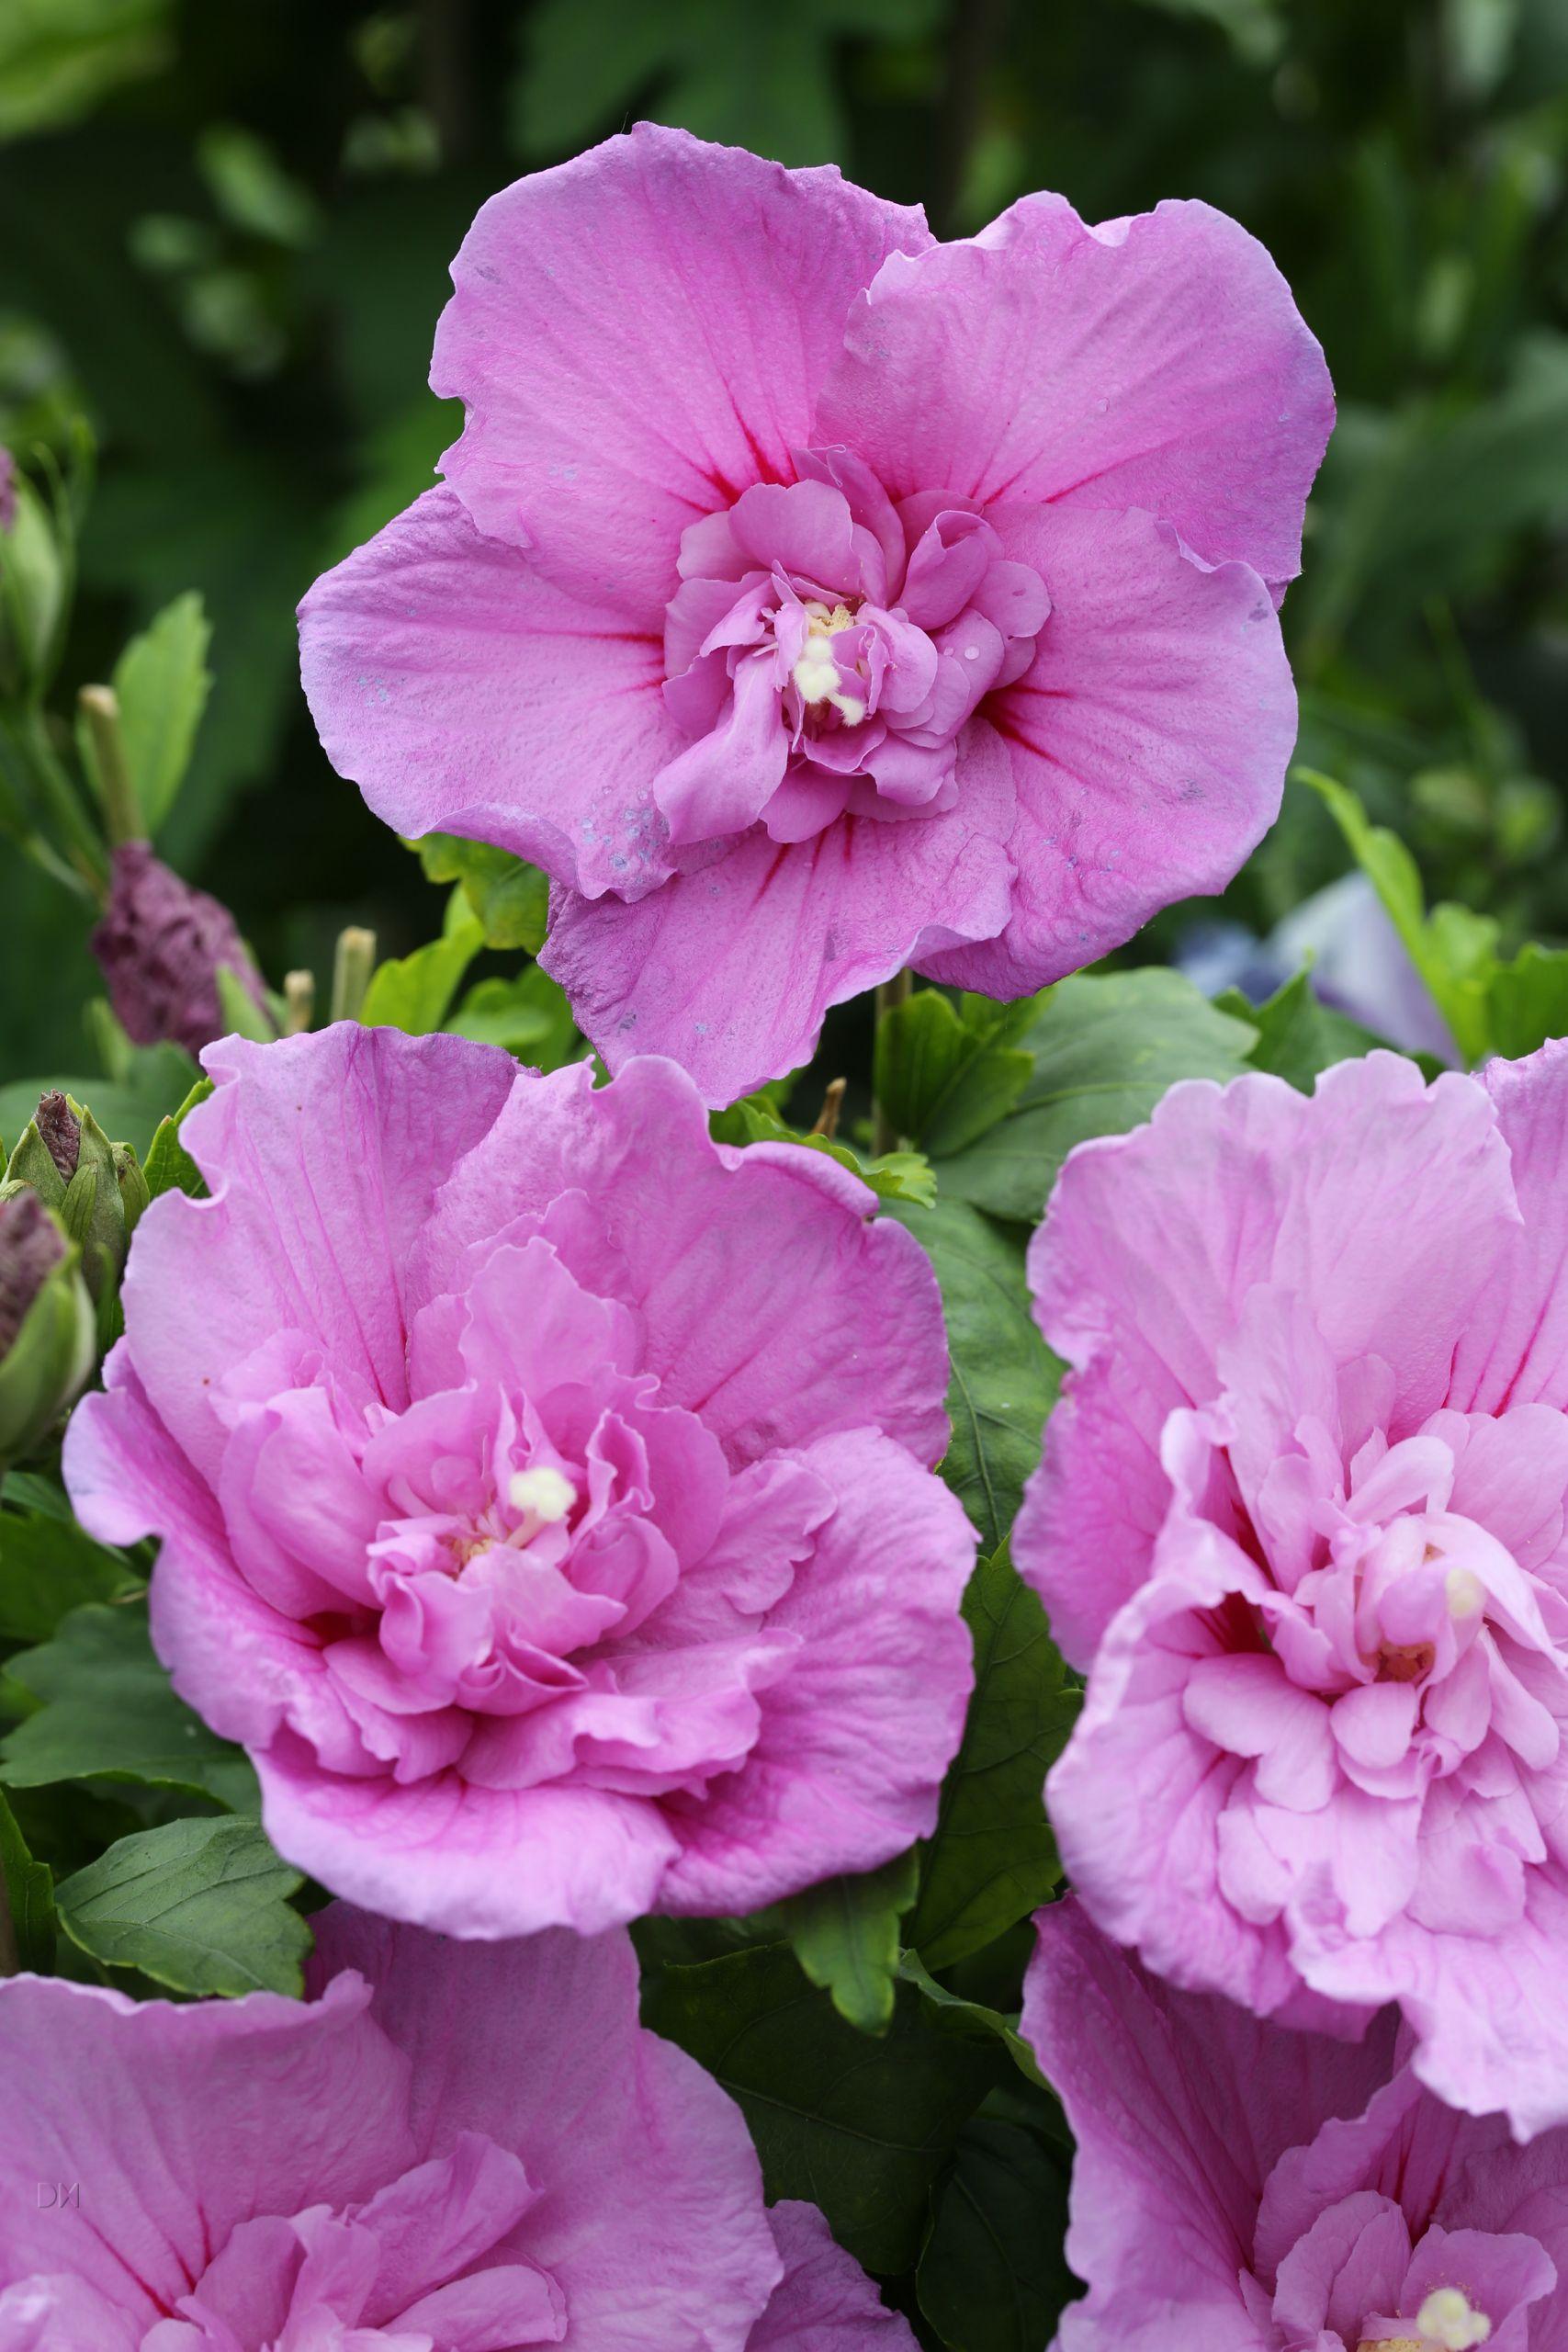 Hibiscus syriacus Lavender Chiffon Notwoodone PBR 1S1B4446